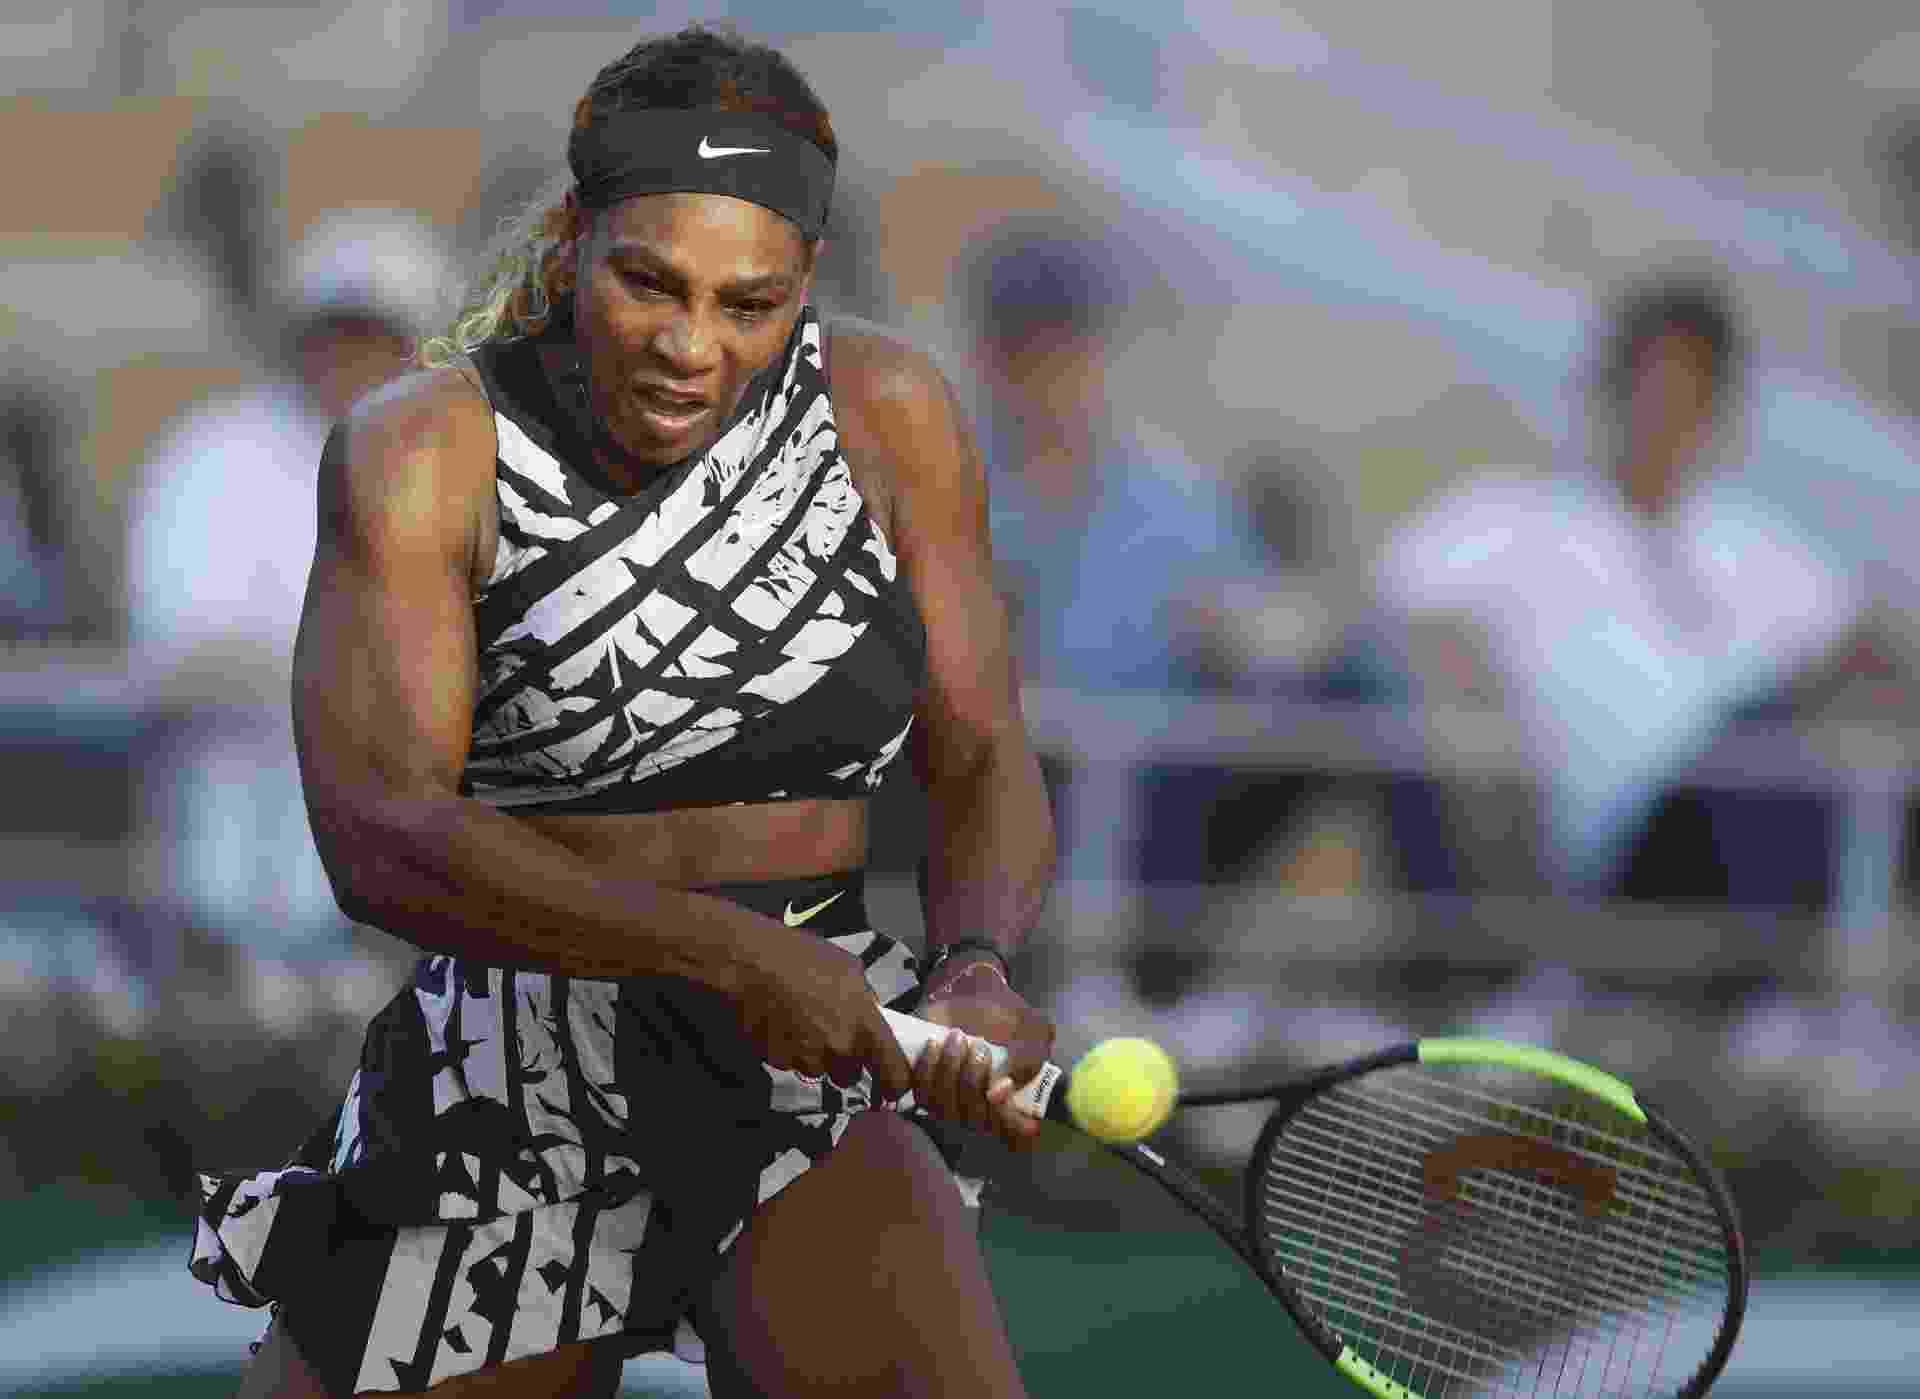 Tenista Serena Williams - undefined